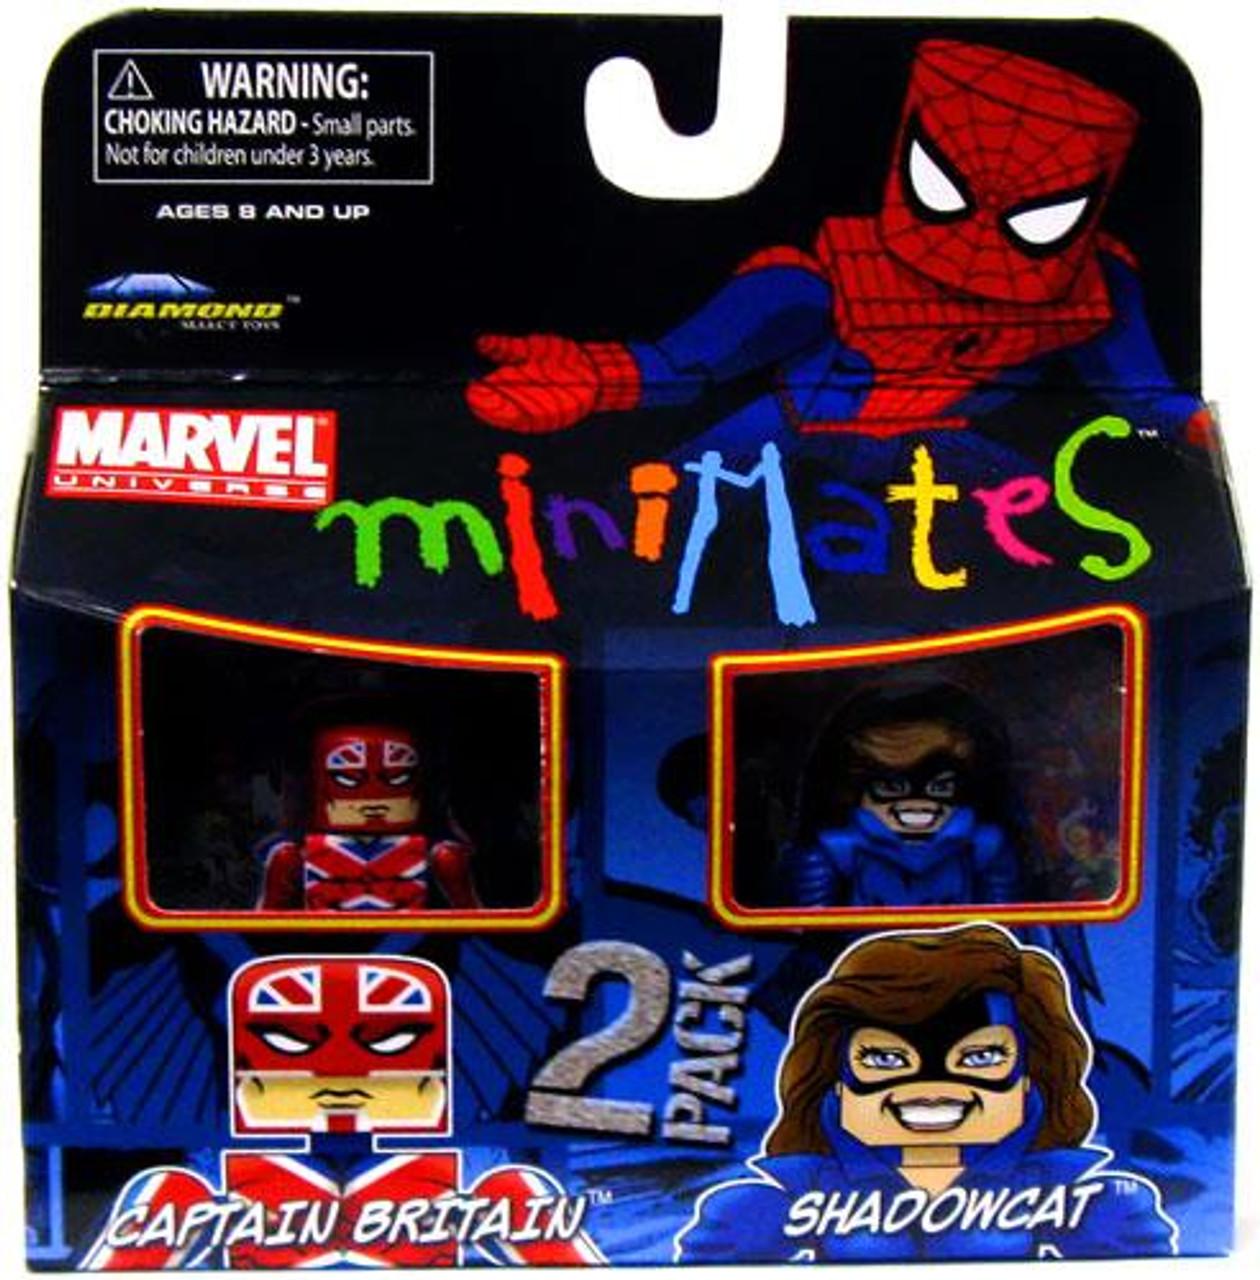 Marvel Universe Minimates Series 31 Captain Britain & Shadowcat Minifigure 2-Pack